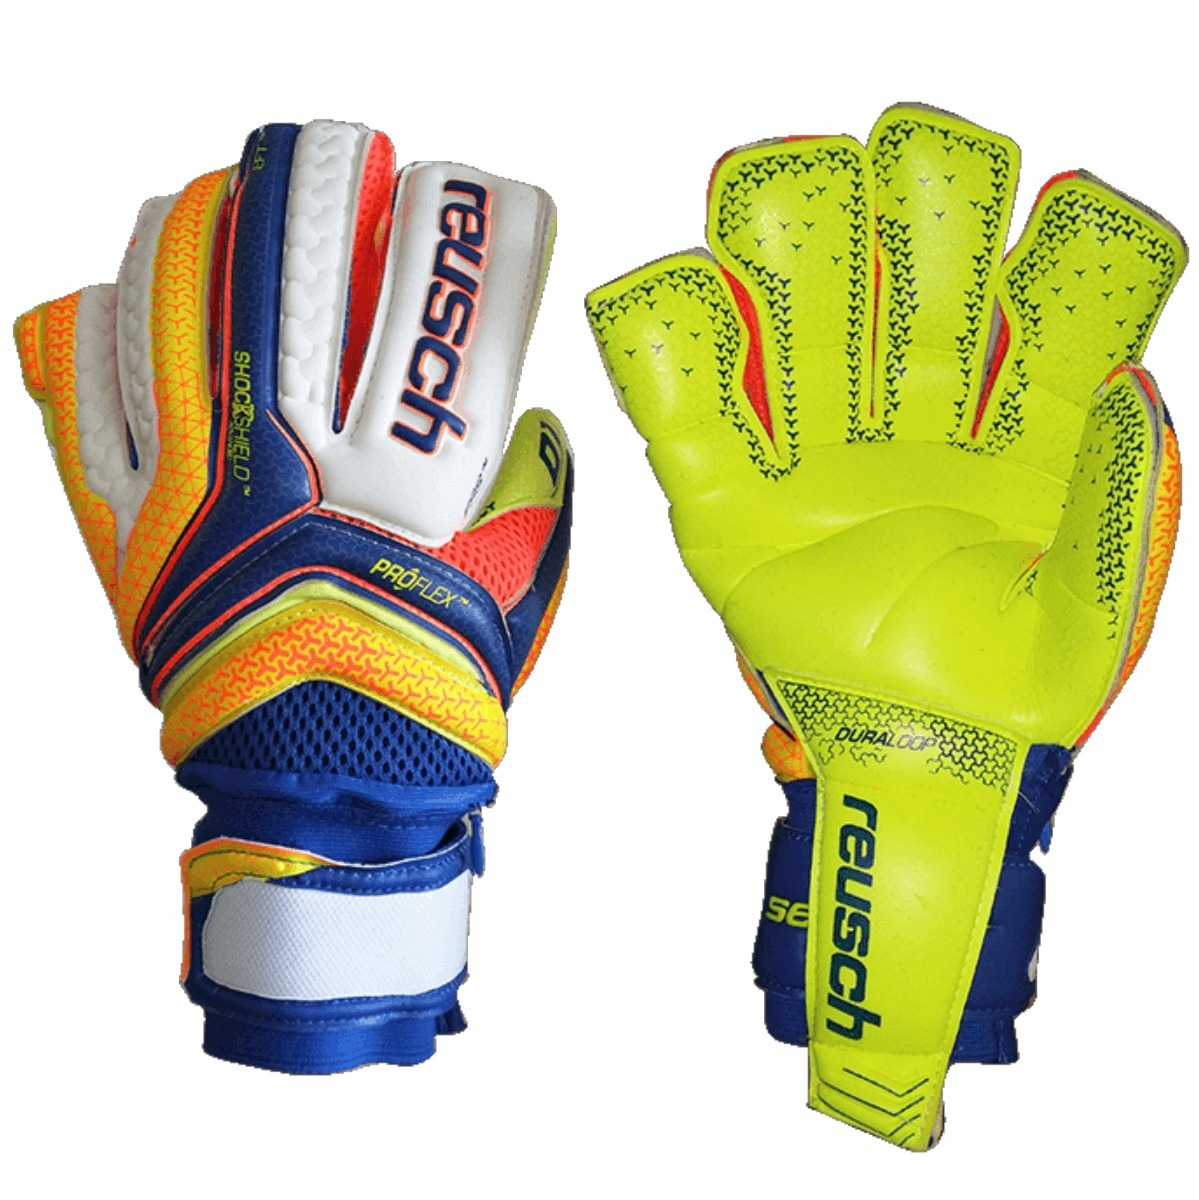 f33ffcc759b99 guantes arquero reusch serathor supreme ortho tec profesio. Cargando zoom.